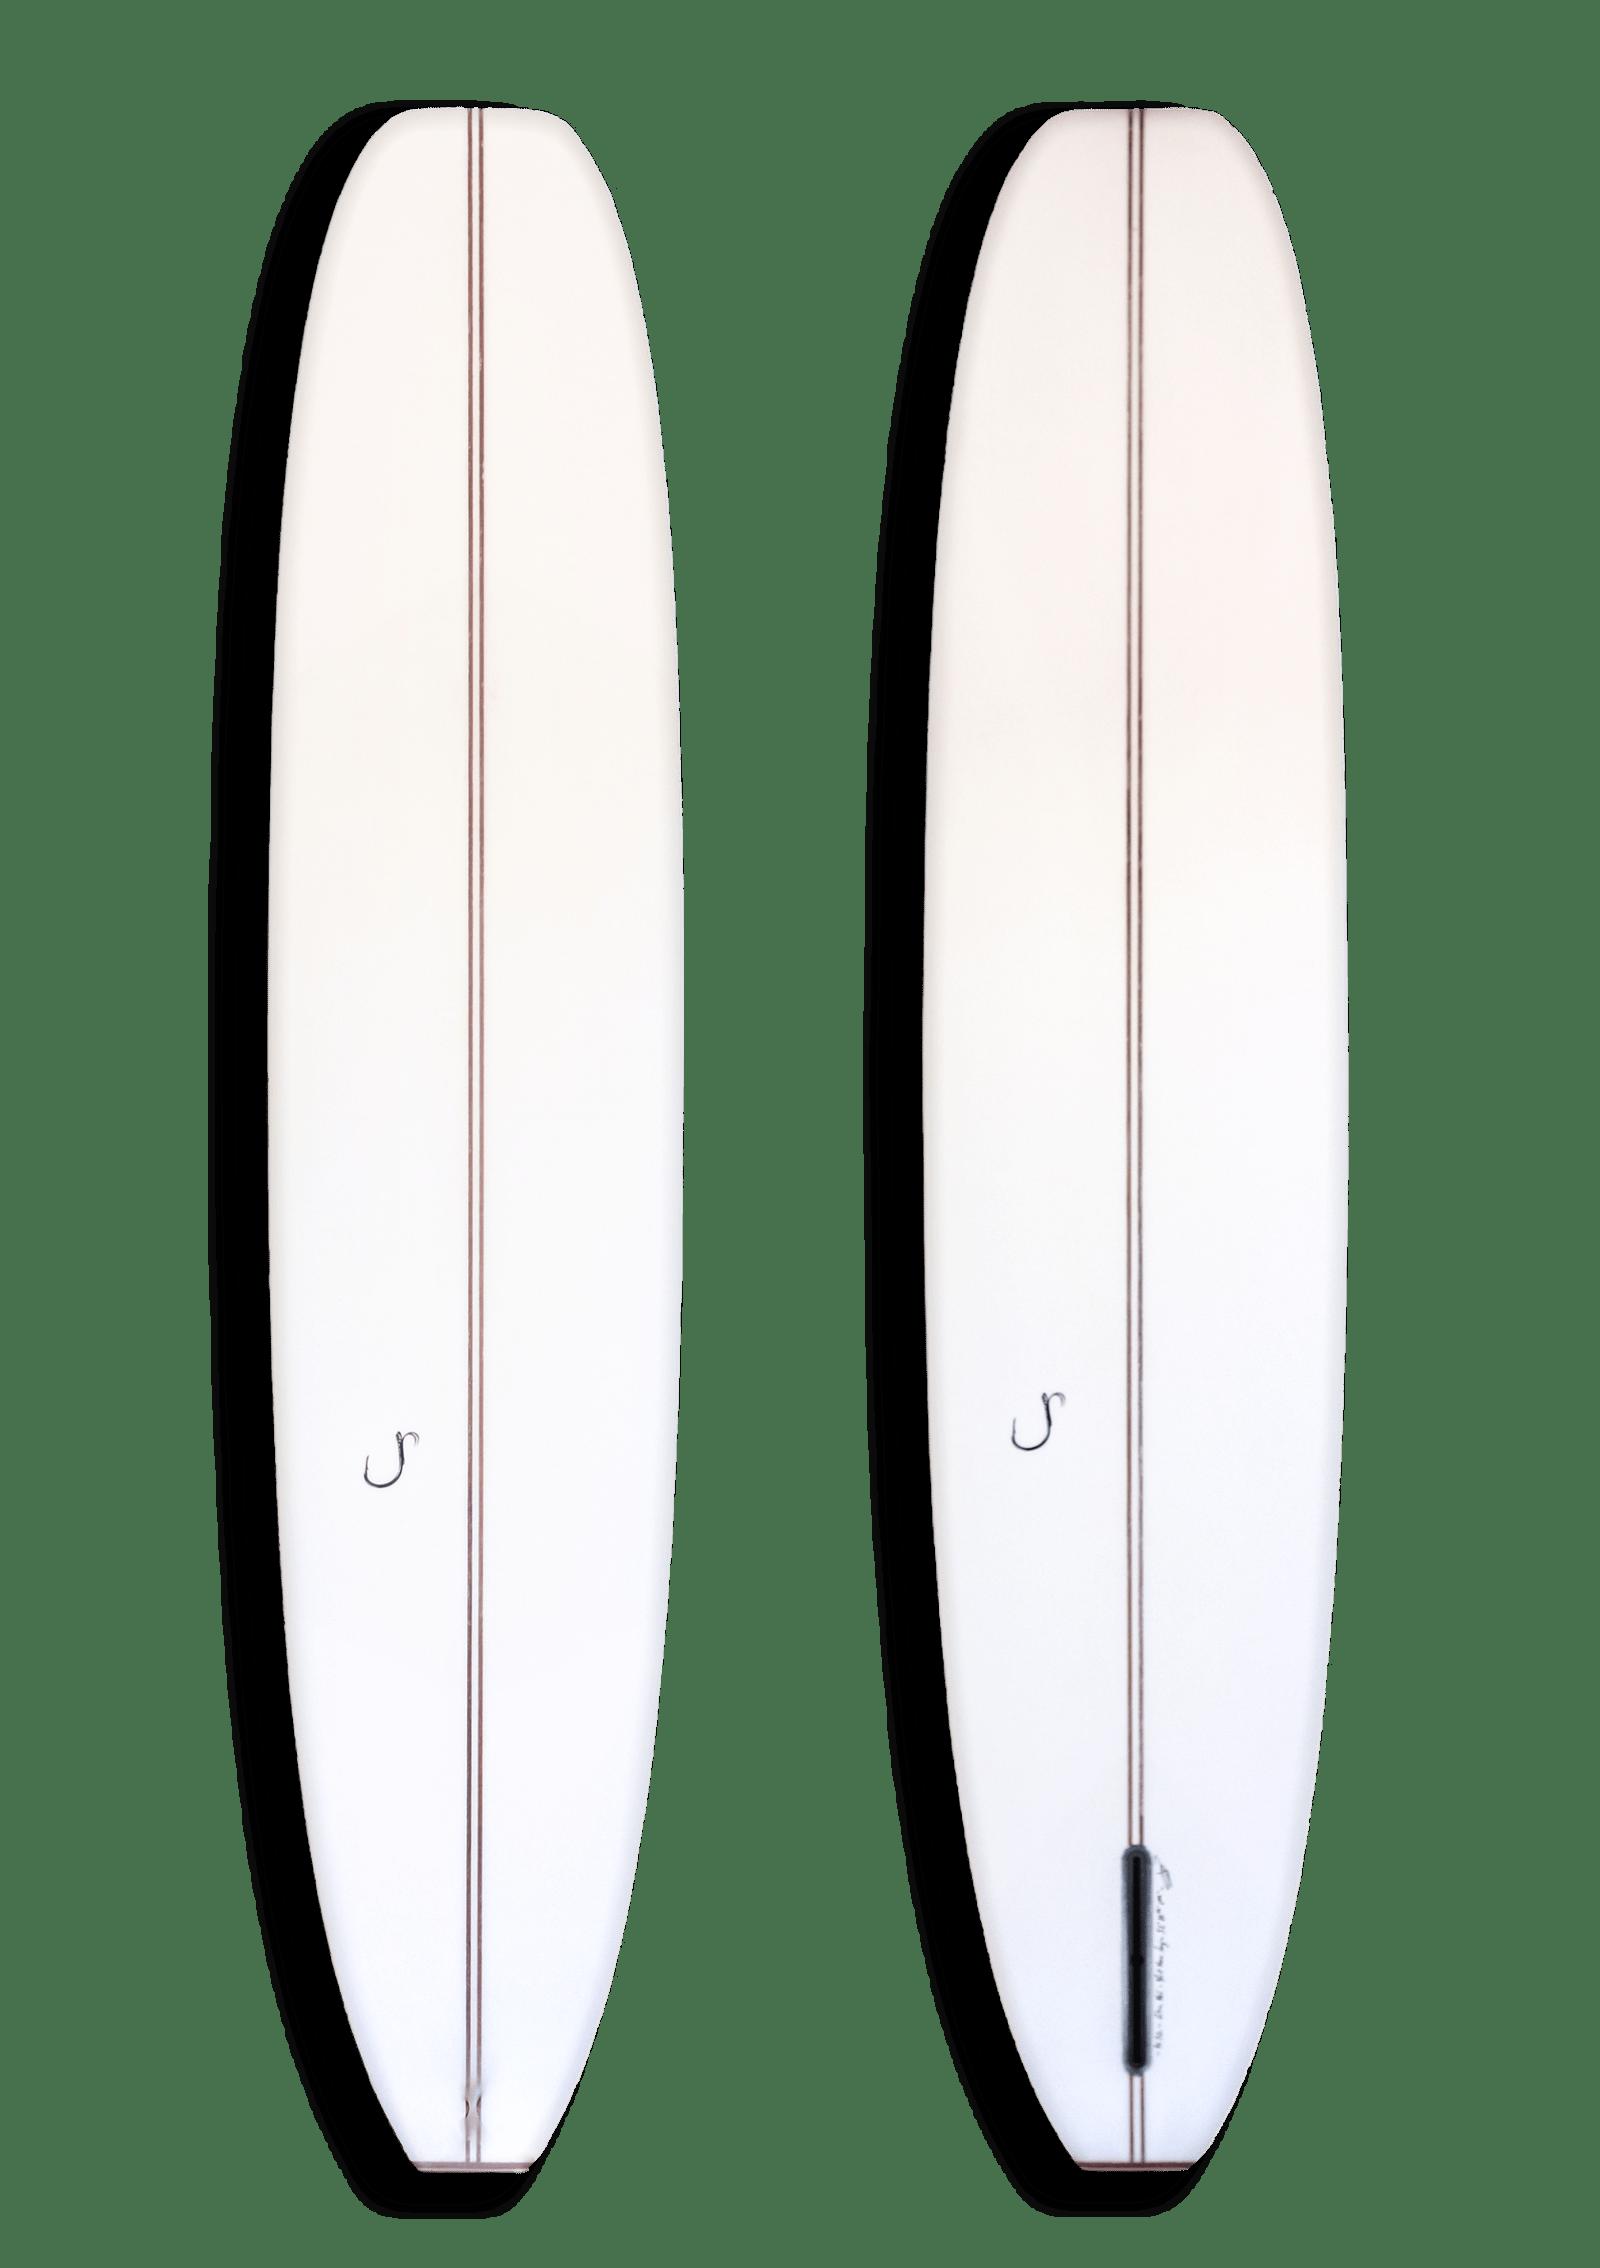 cachalot surfboards Lauzin blunt